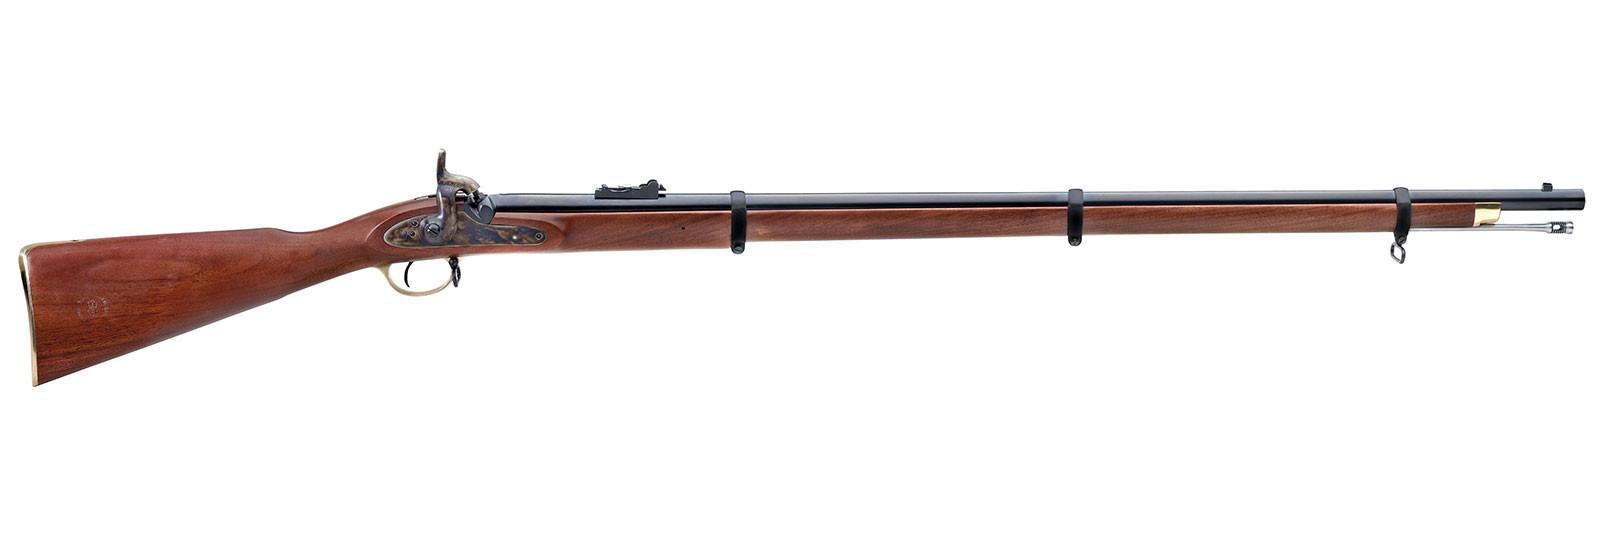 Enfield 3 band P1853 Rifle